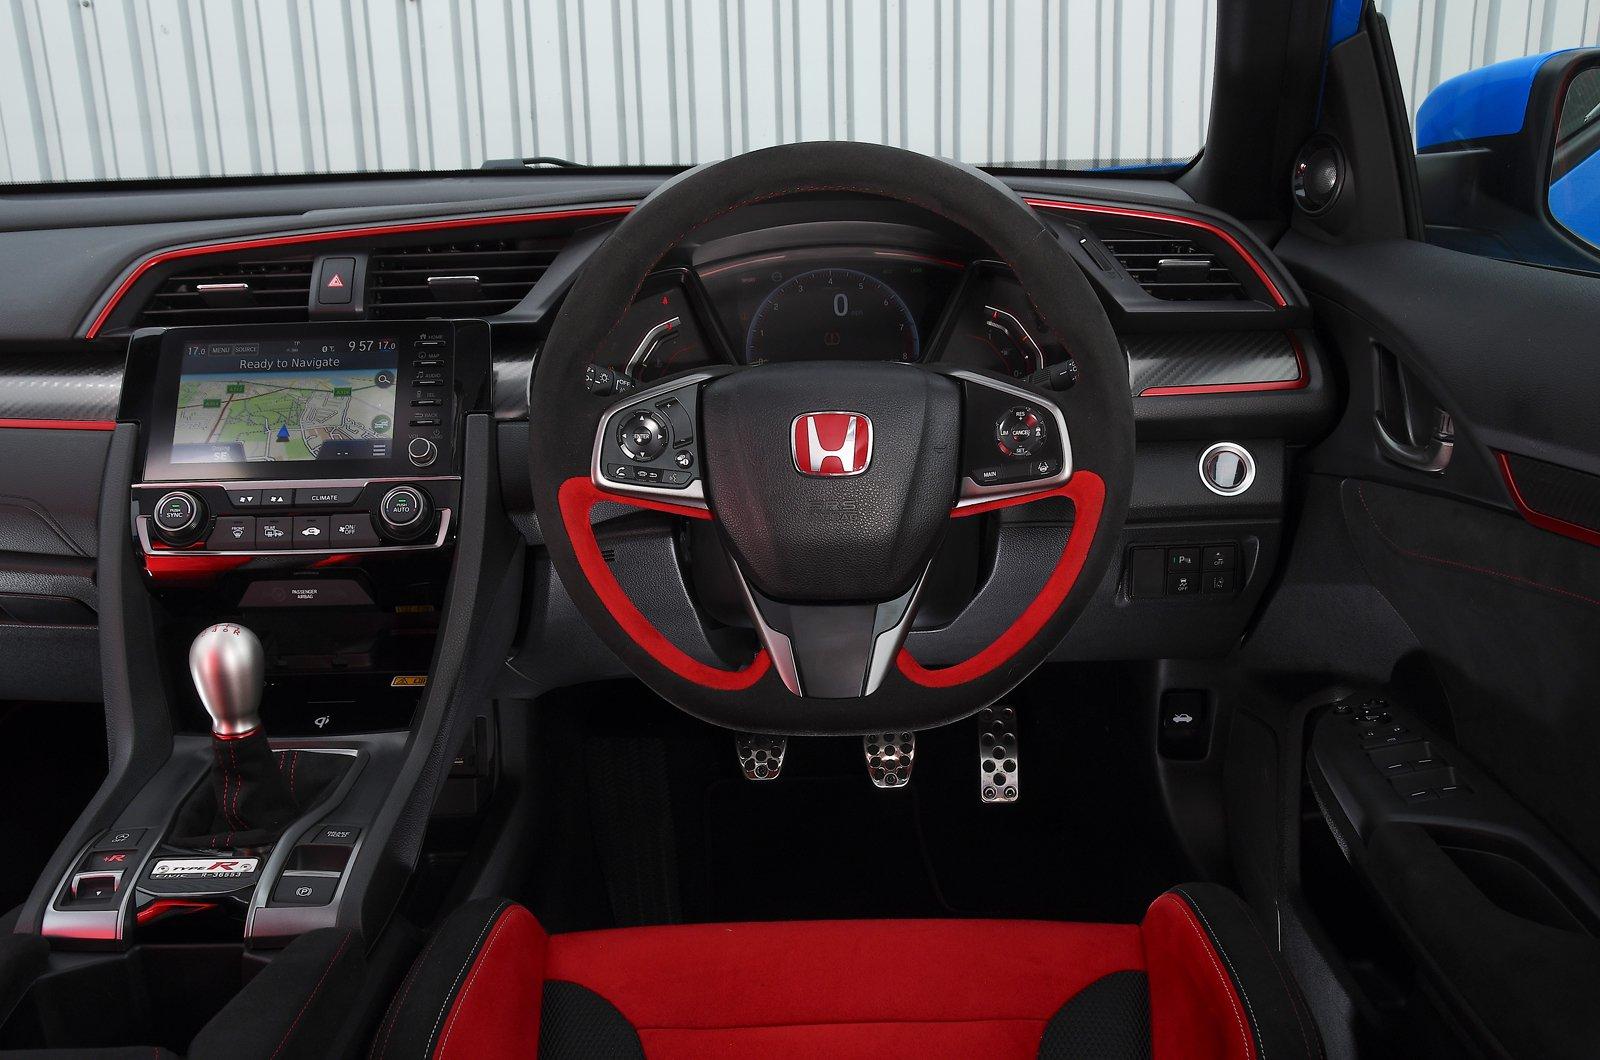 2020 Honda Civic Type R dashboard